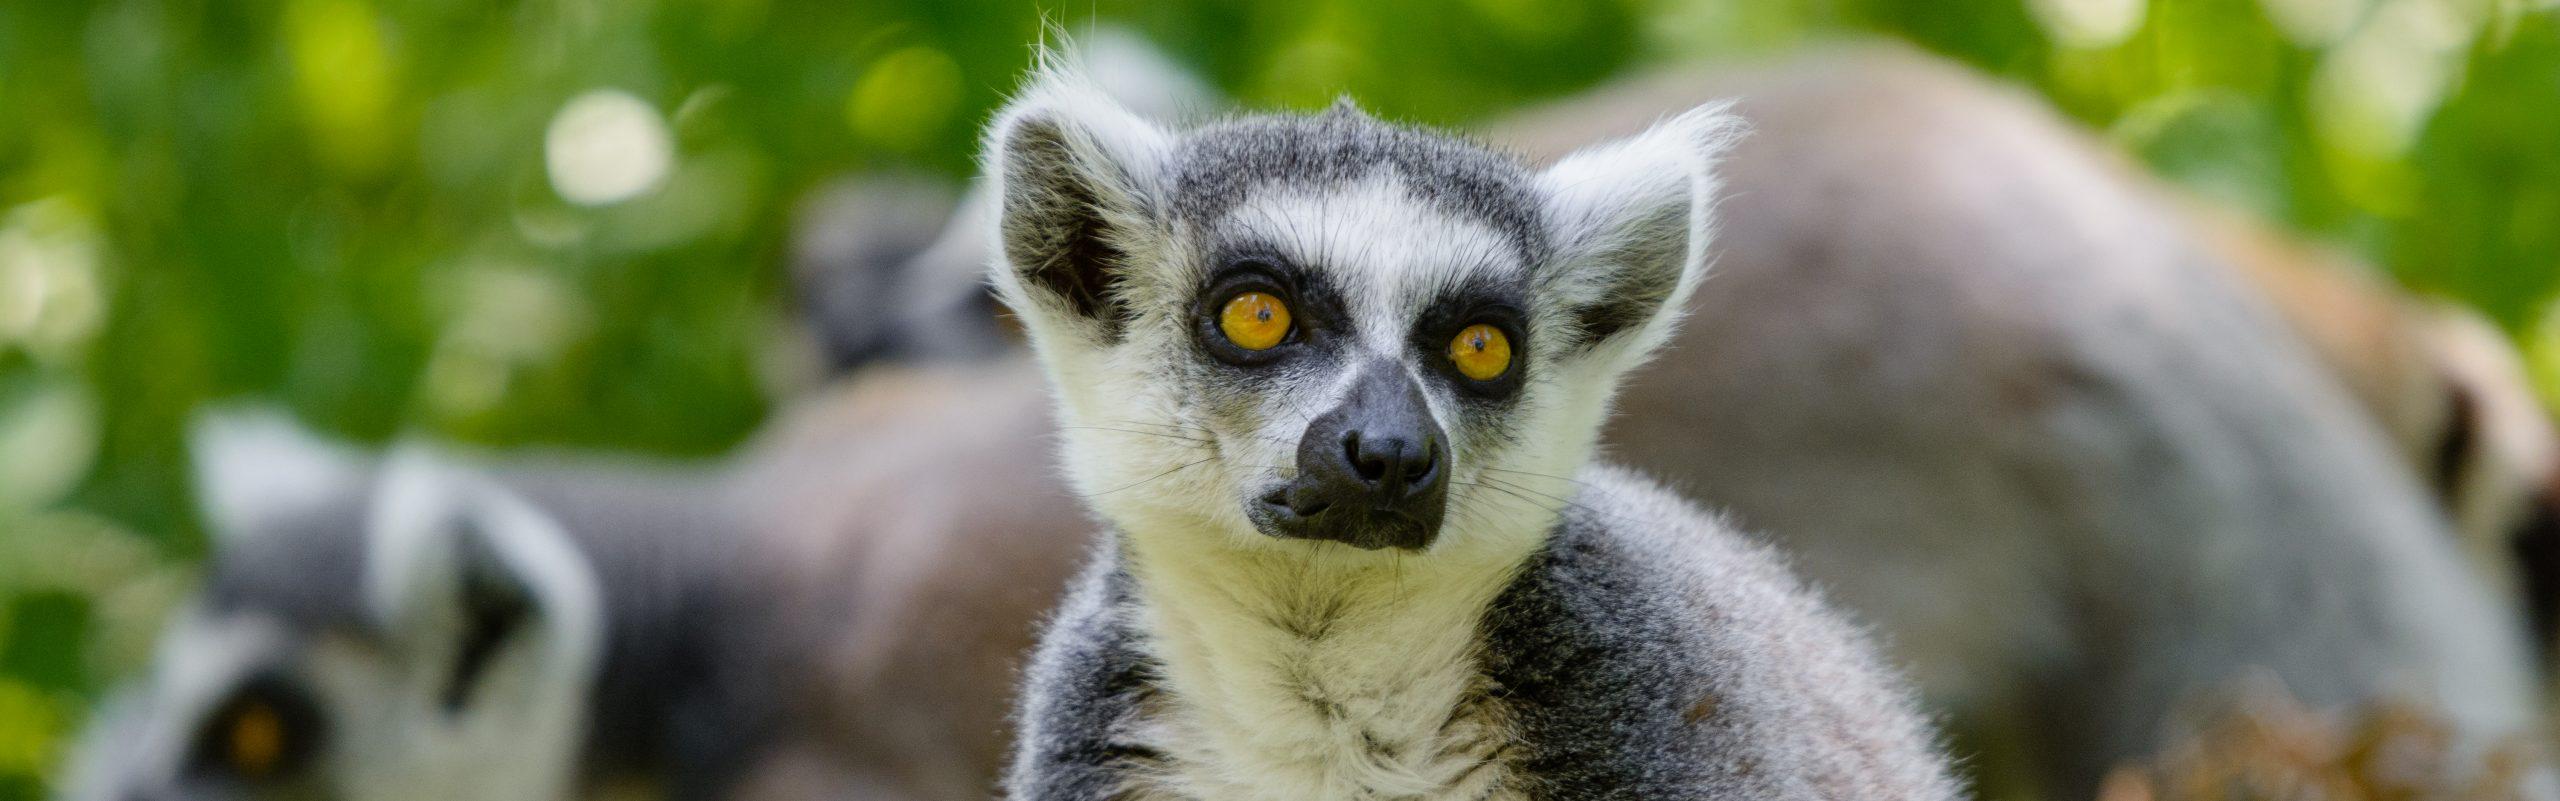 https://faunafocus.com/home/november-2018-ring-tailed-lemur/#jp-carousel-11938